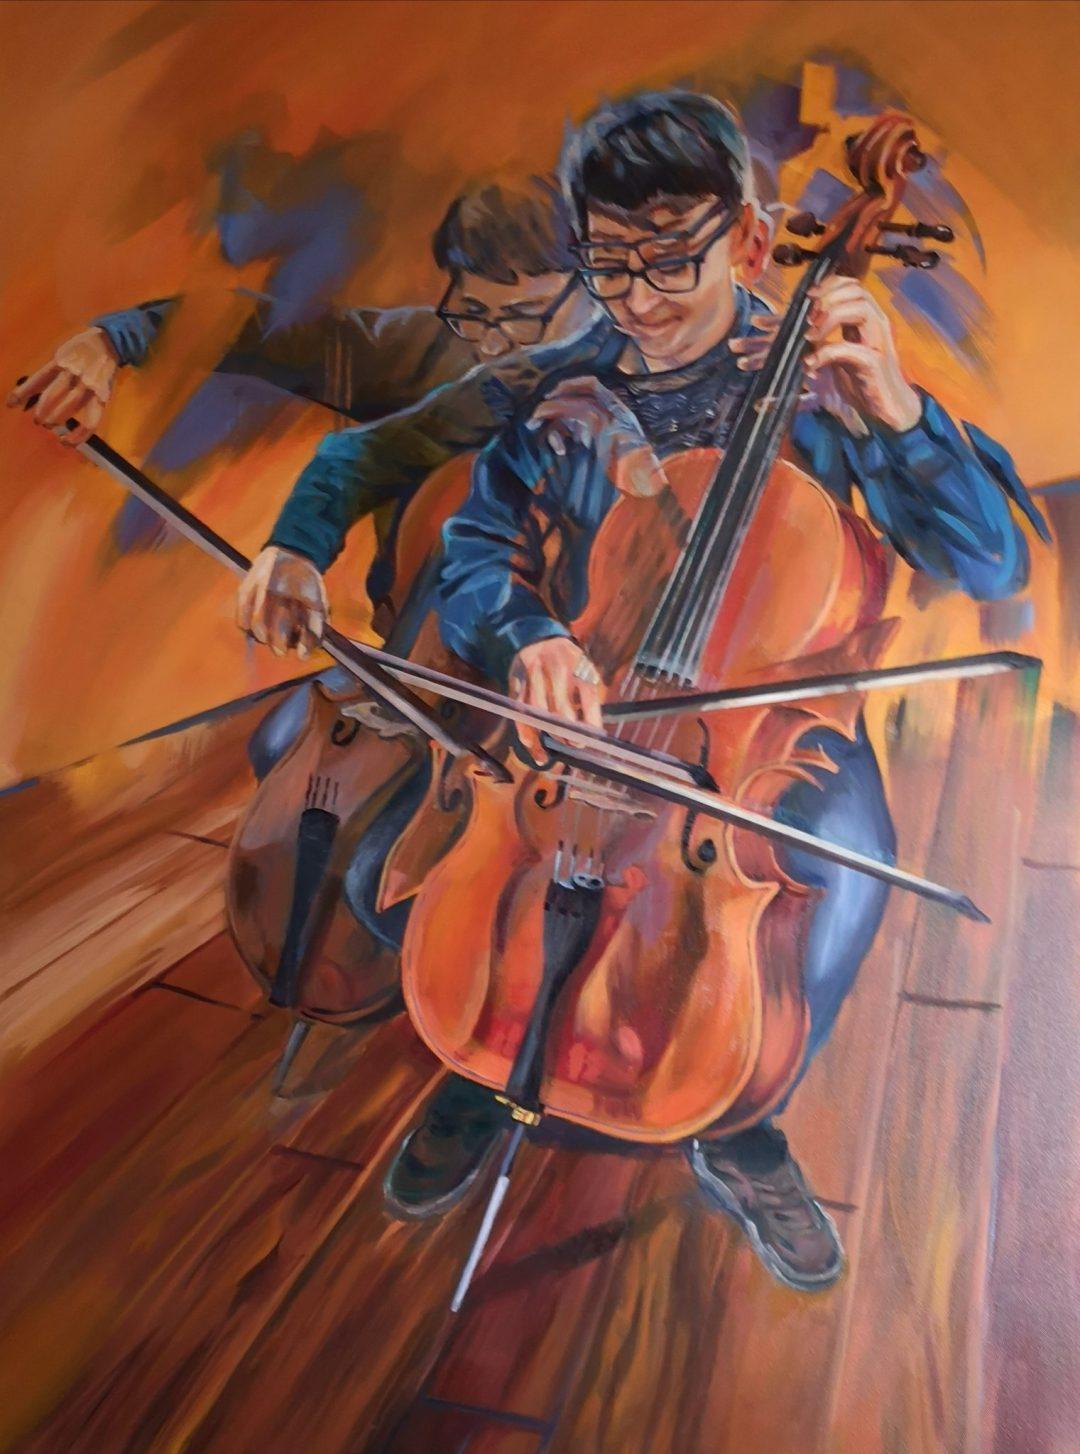 Ben – The Cellist